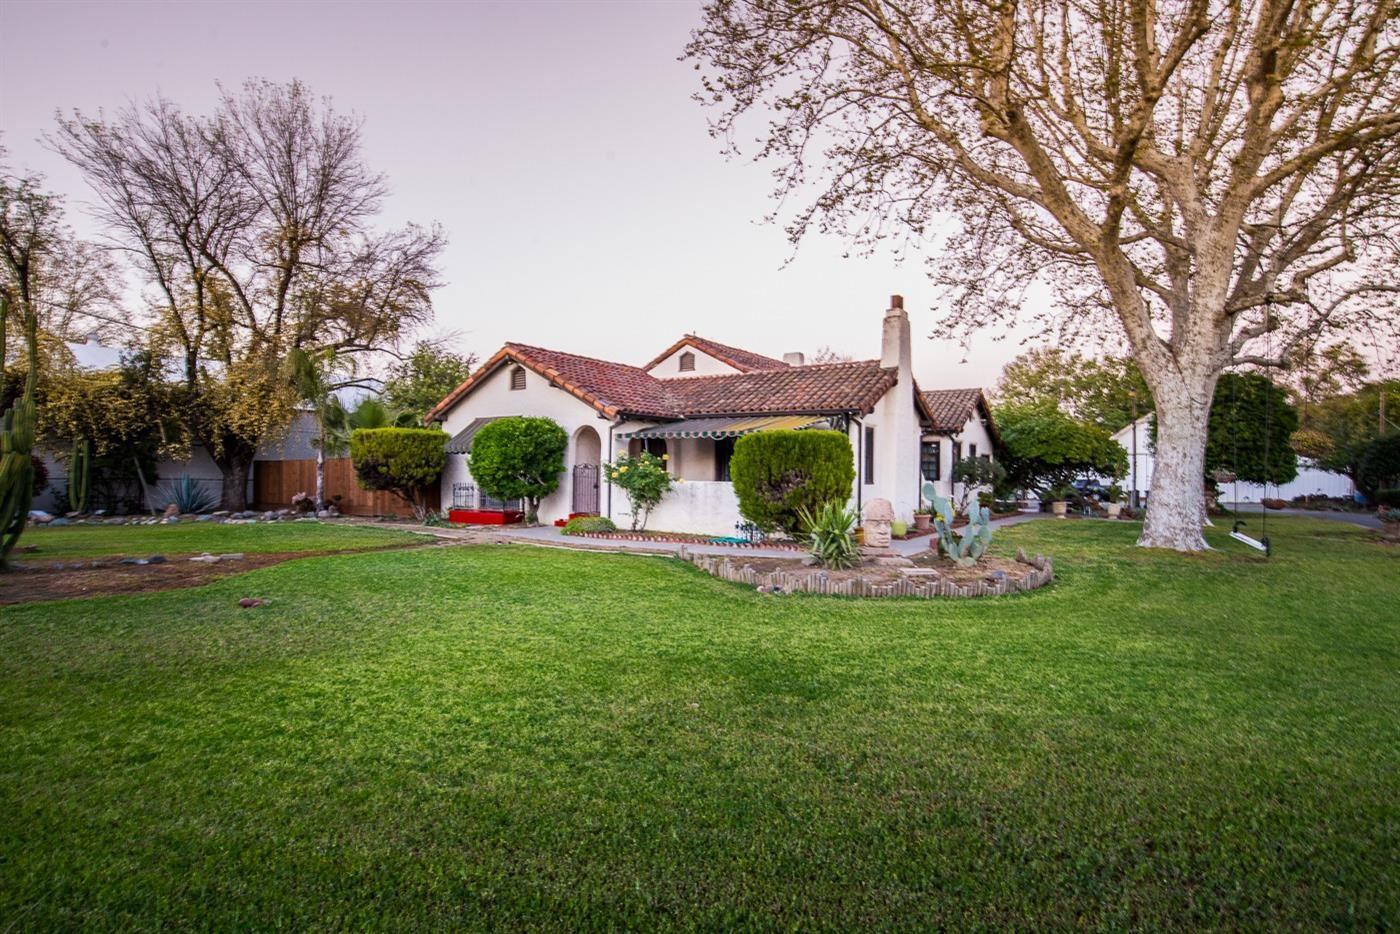 Photo of 125 East Street, Woodland, CA 95776 (MLS # 221049614)